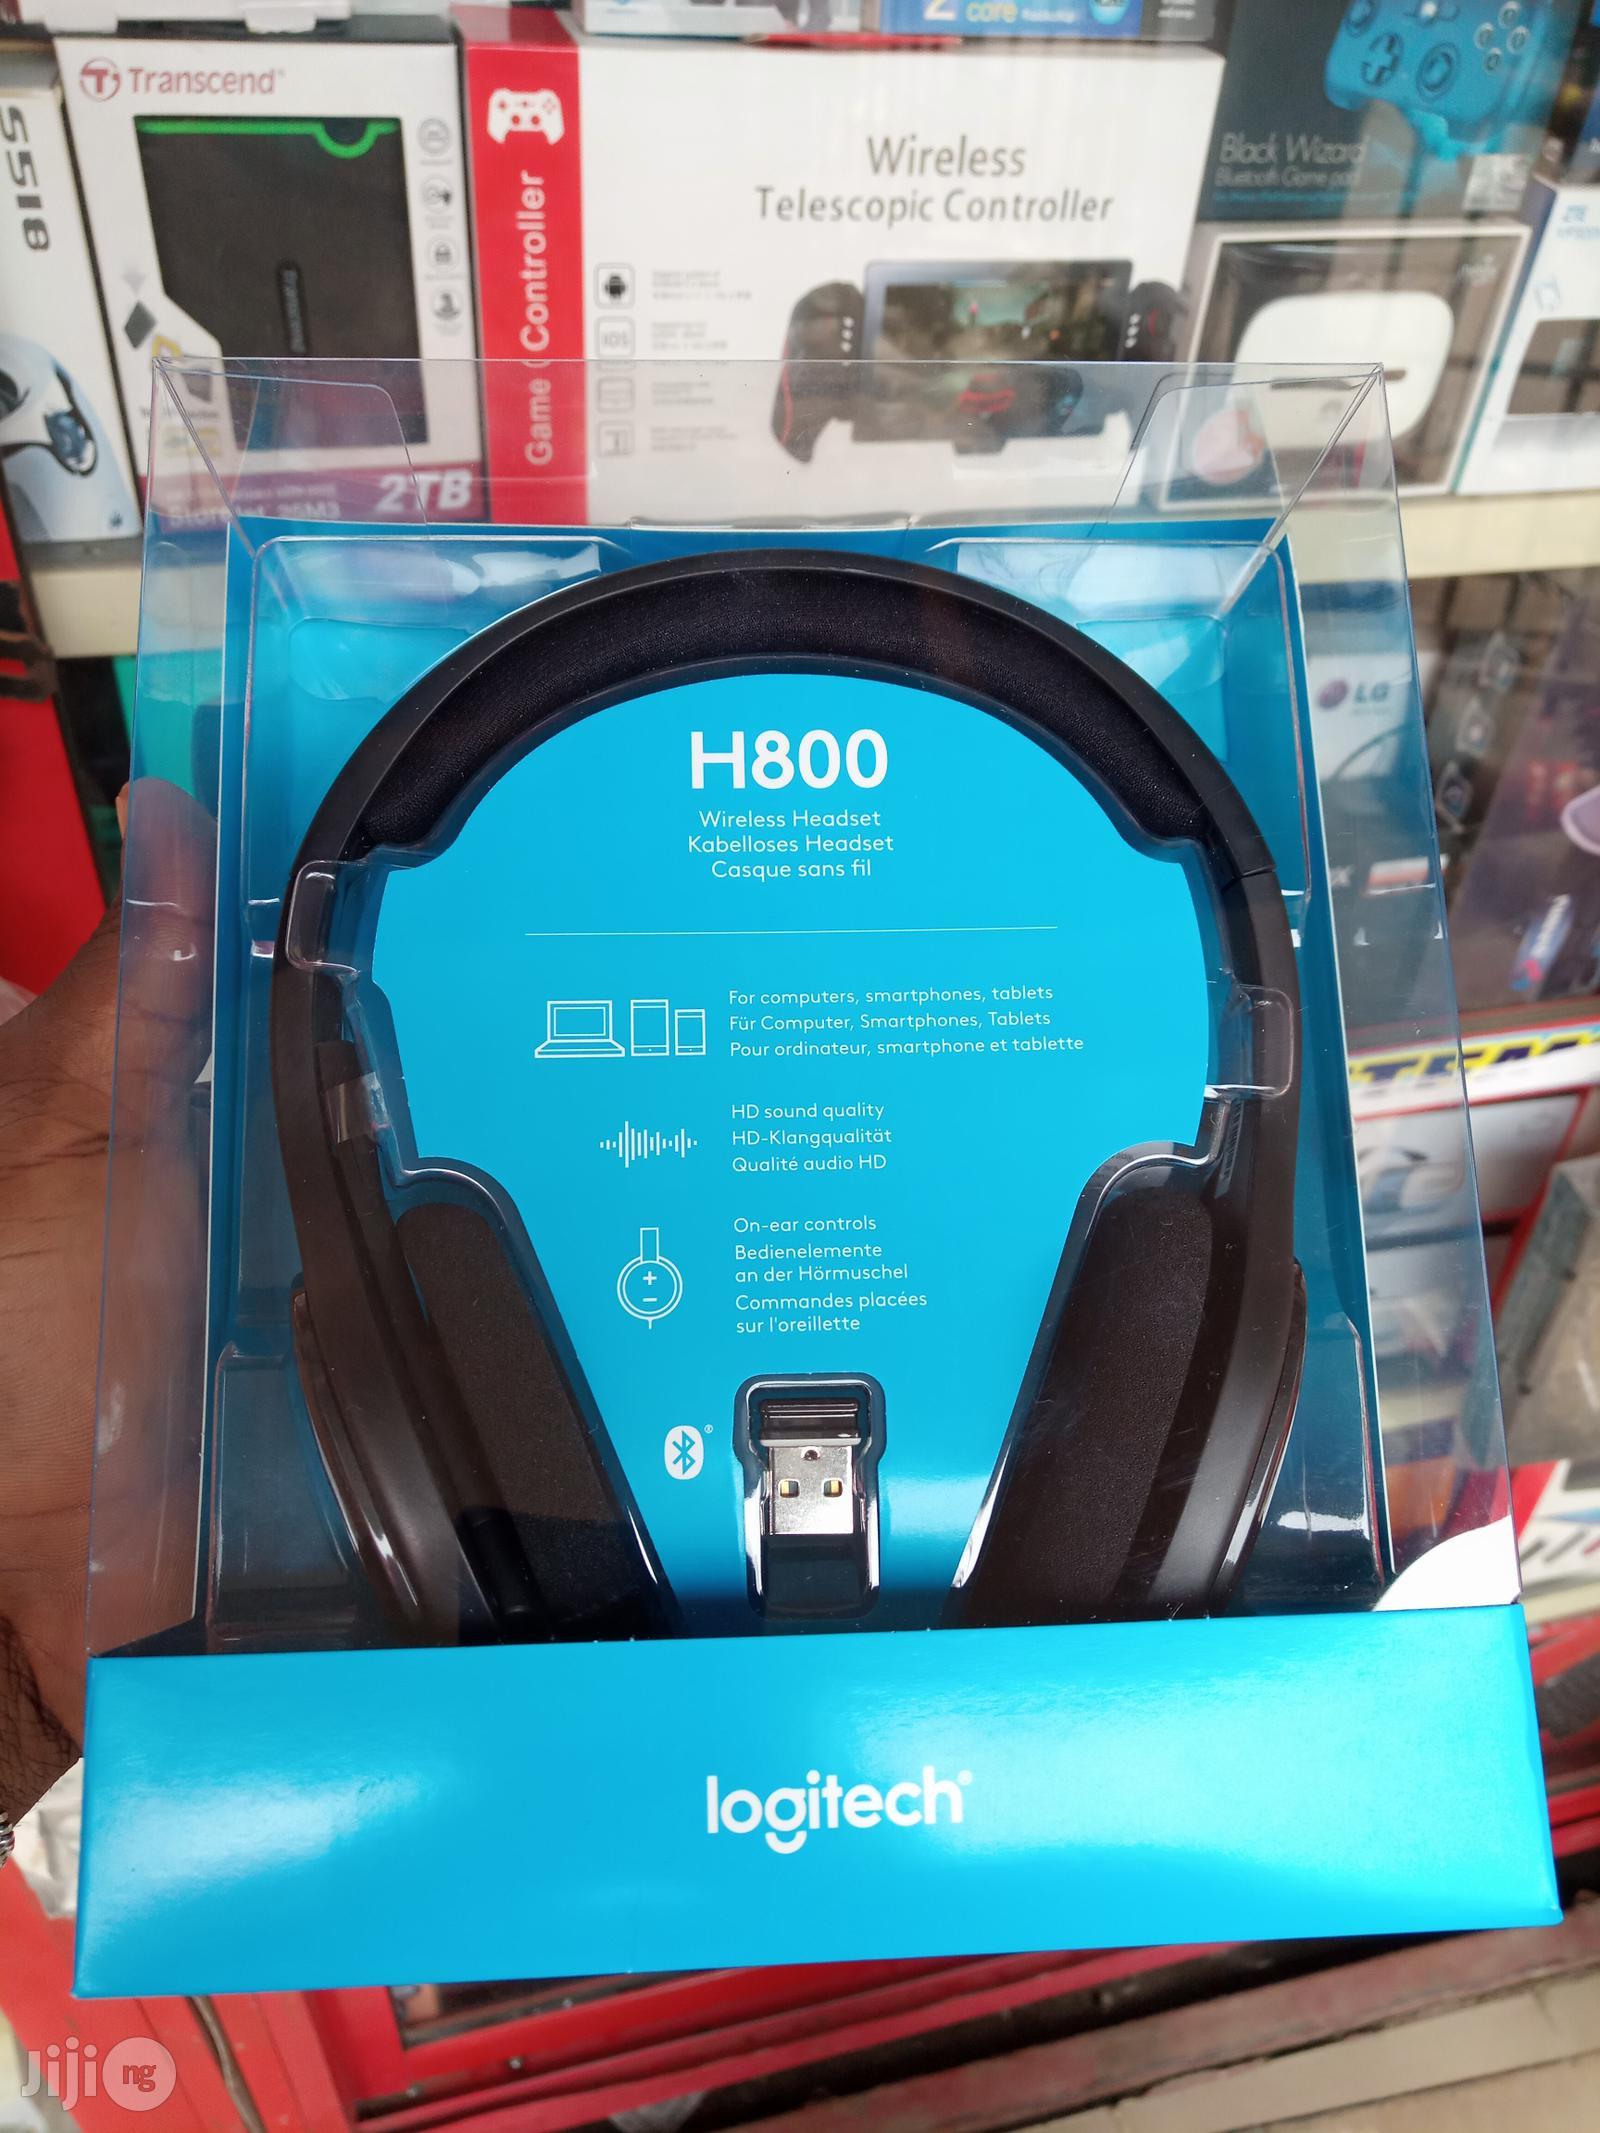 Bluetooth Logitech Headphone H800 In Ikeja Headphones Don Captain Gadgets Jiji Ng For Sale In Ikeja Buy Headphones From Don Captain Gadgets On Jiji Ng